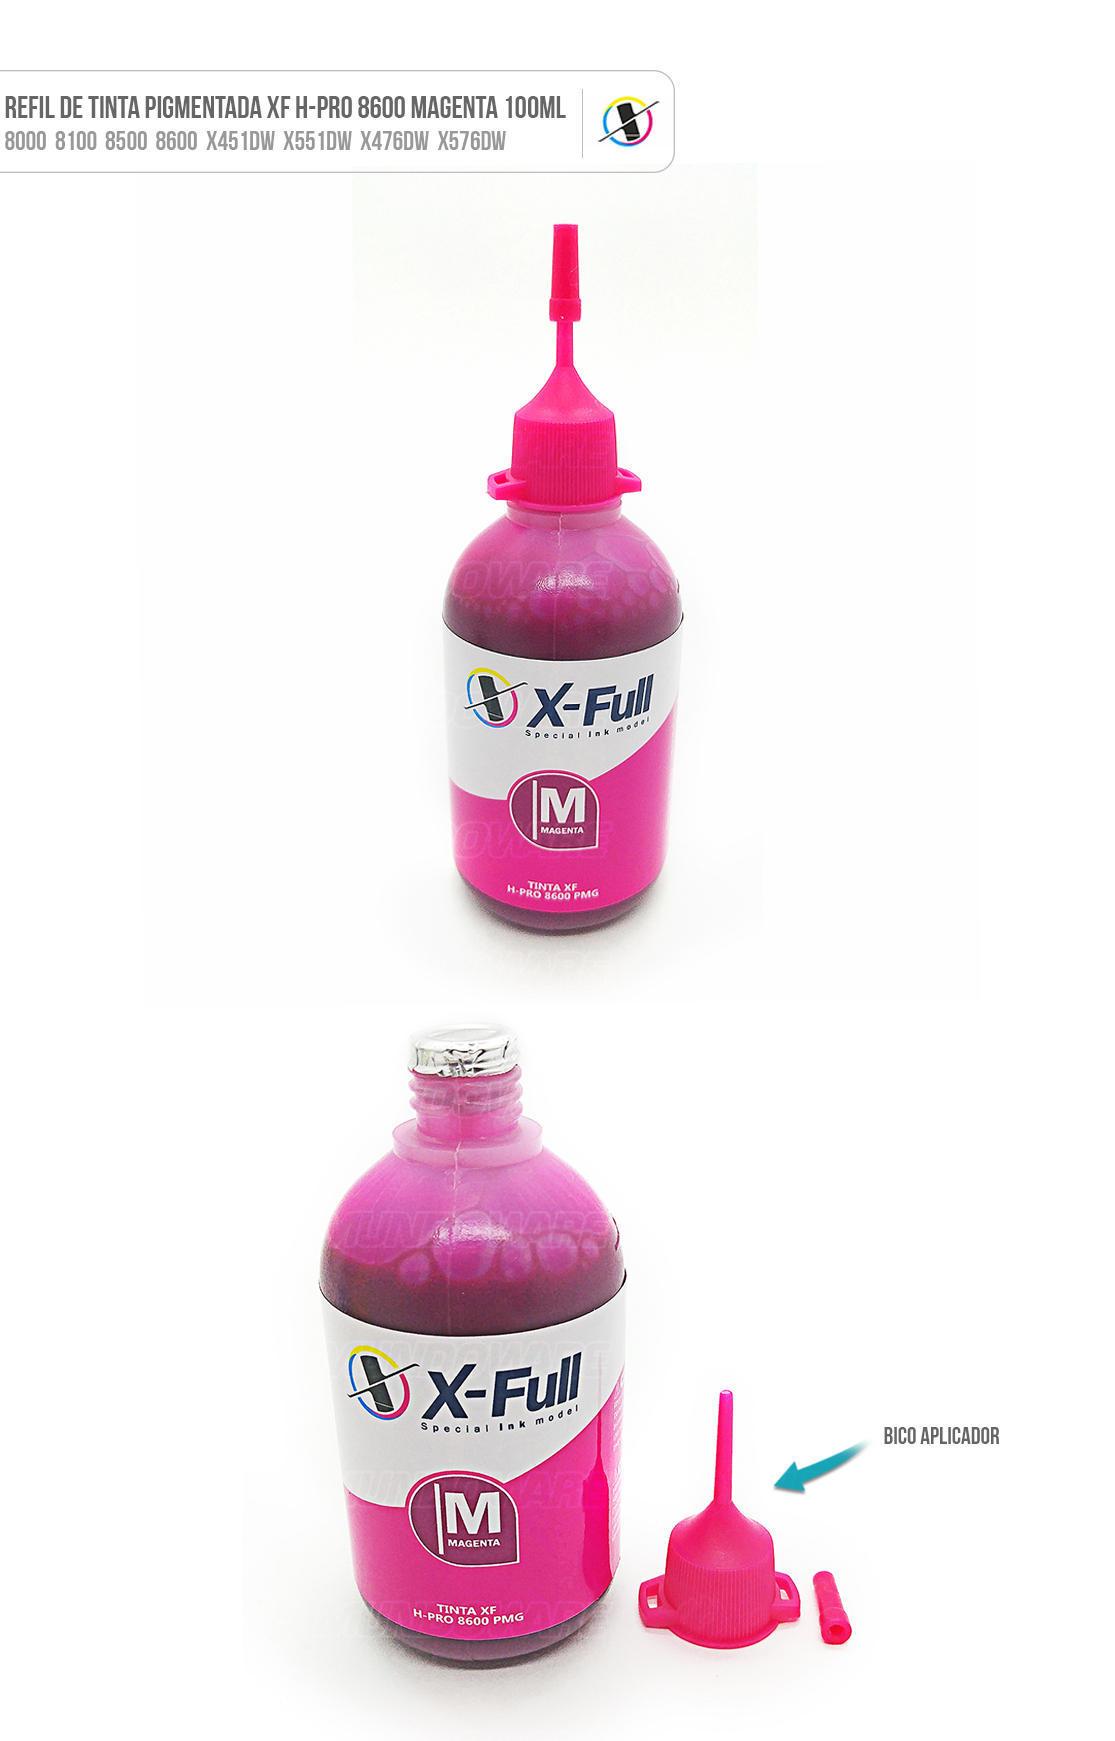 Tinta Magenta Pigmentada para Bulk-ink Tanque de Tinta impressora 8000 8100 8500 8600 X451dw X551dw X476dw X576dw